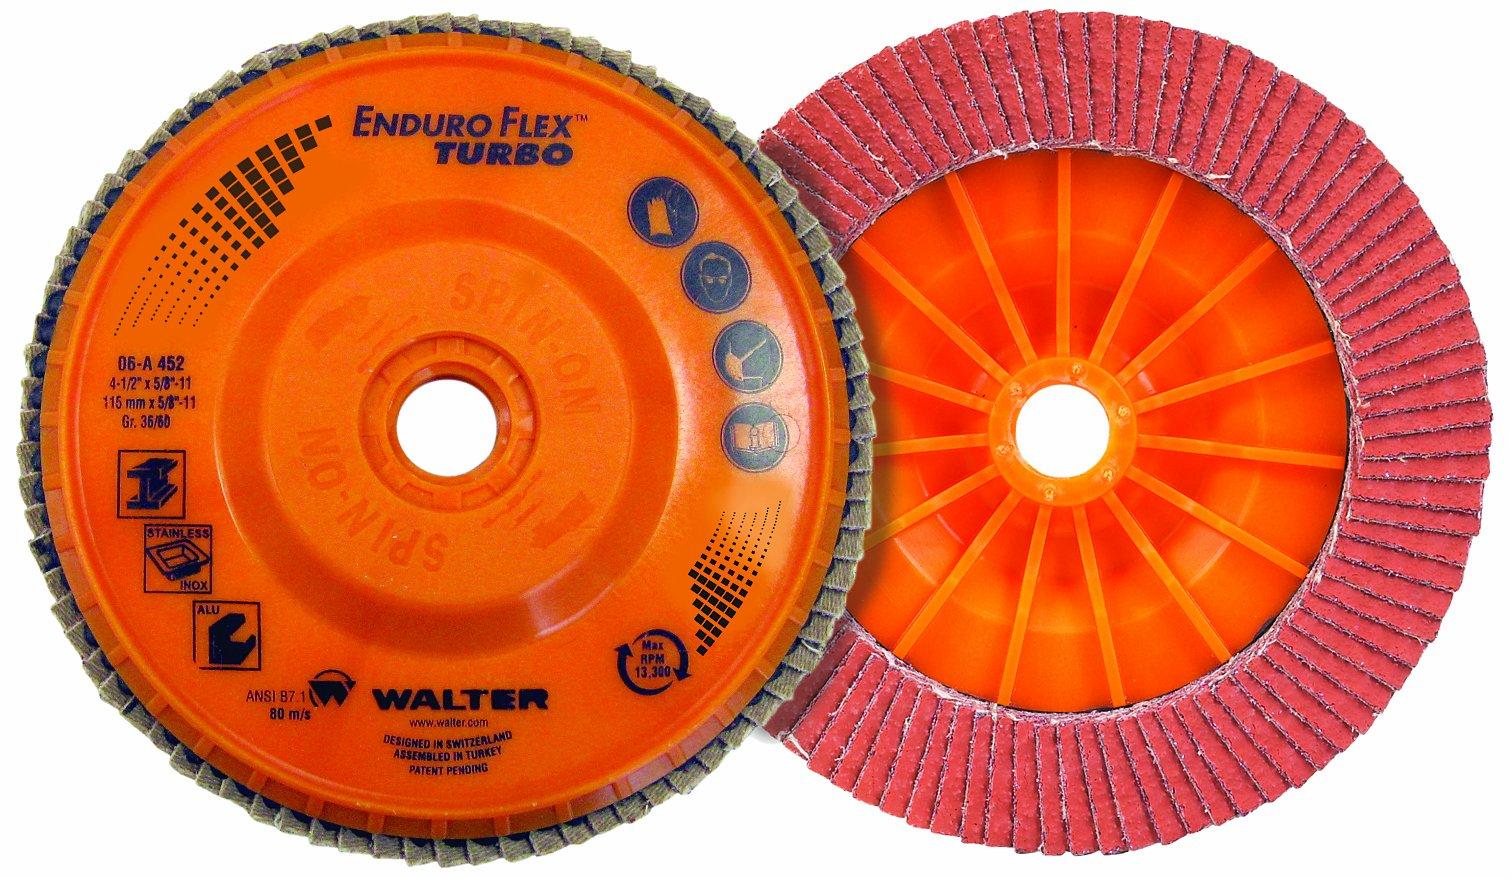 Walter Enduro-Flex Turbo Abrasive Flap Disc, Type 29, 5/8''-11 Thread Size, Plastic Backing, Ceramic, 4-1/2'' Diameter, Grit 36/60 (Pack of 10)